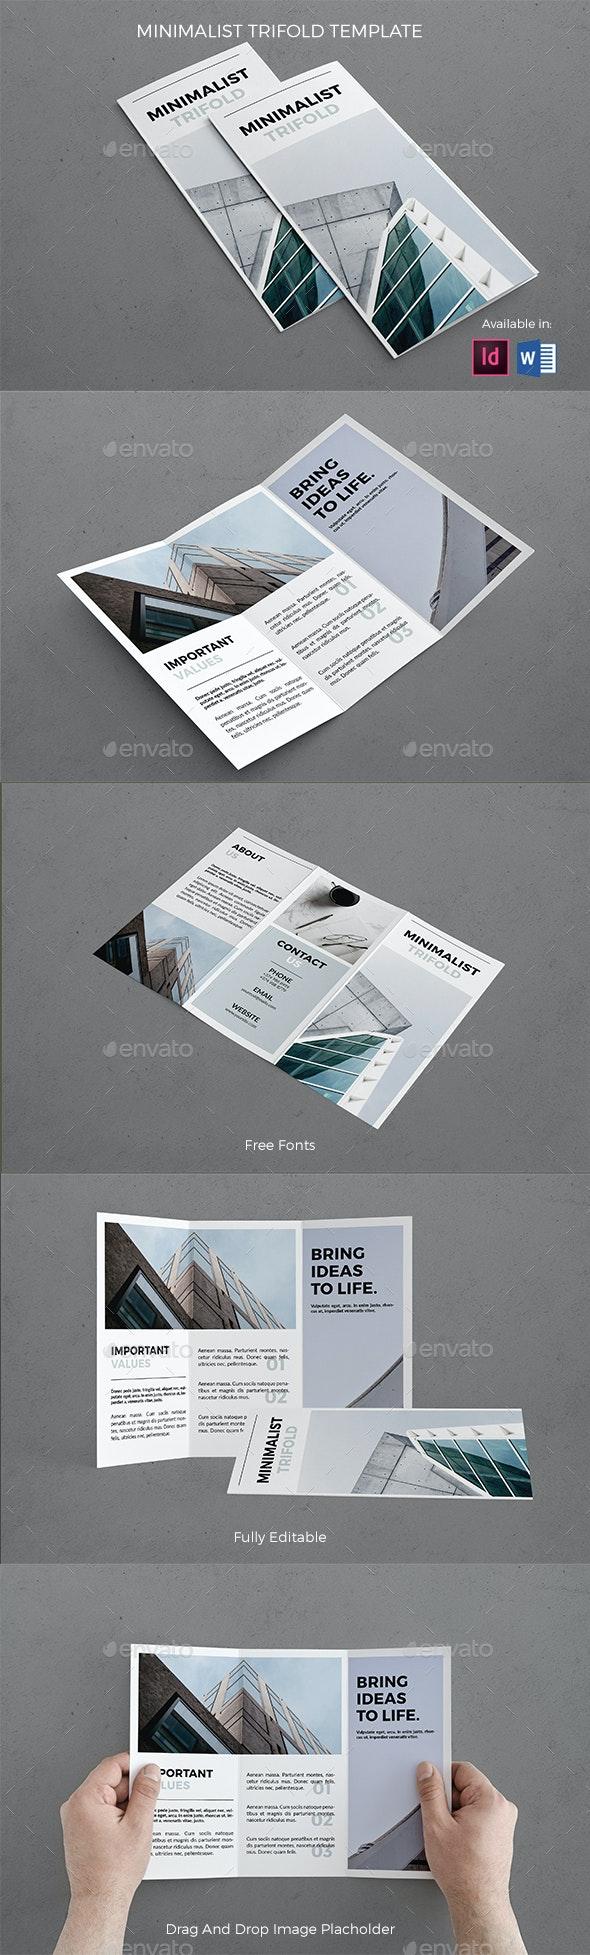 Minimalist Trifold Template - Brochures Print Templates